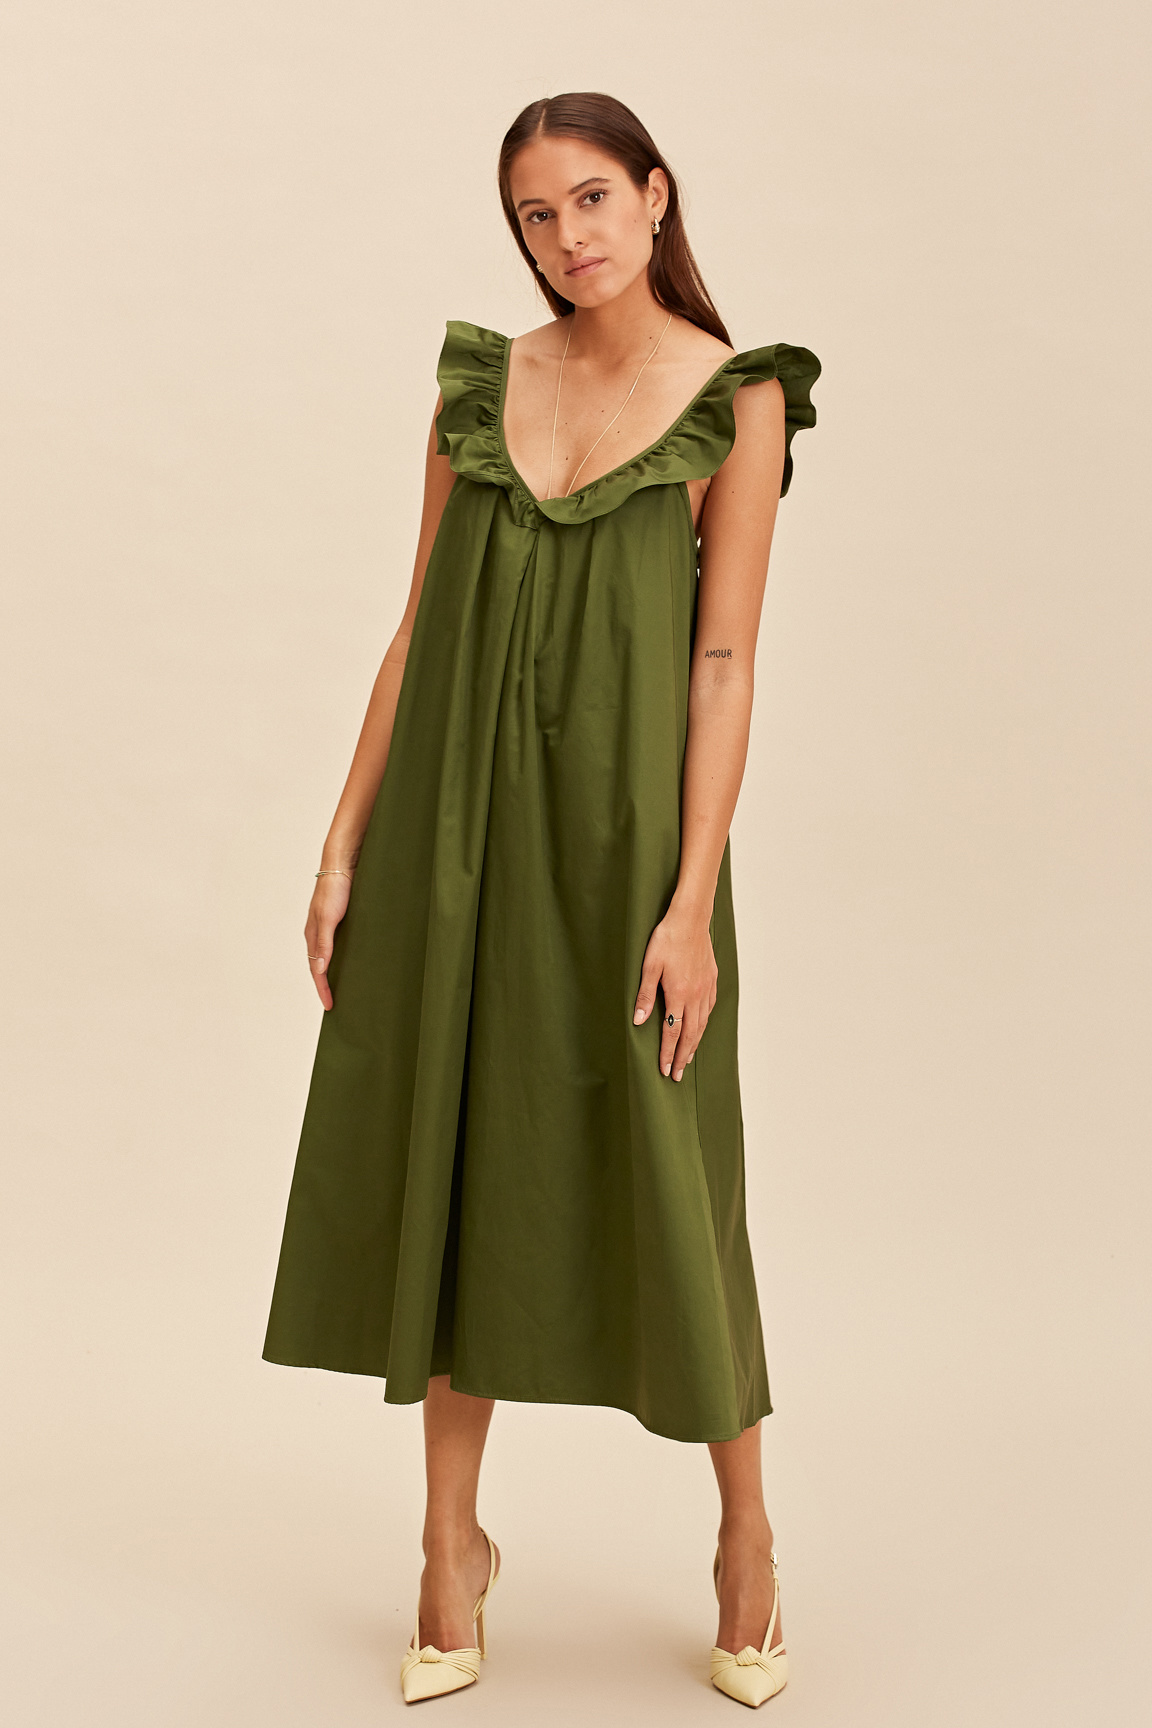 Midi Sleeveless Dress - Olive-2